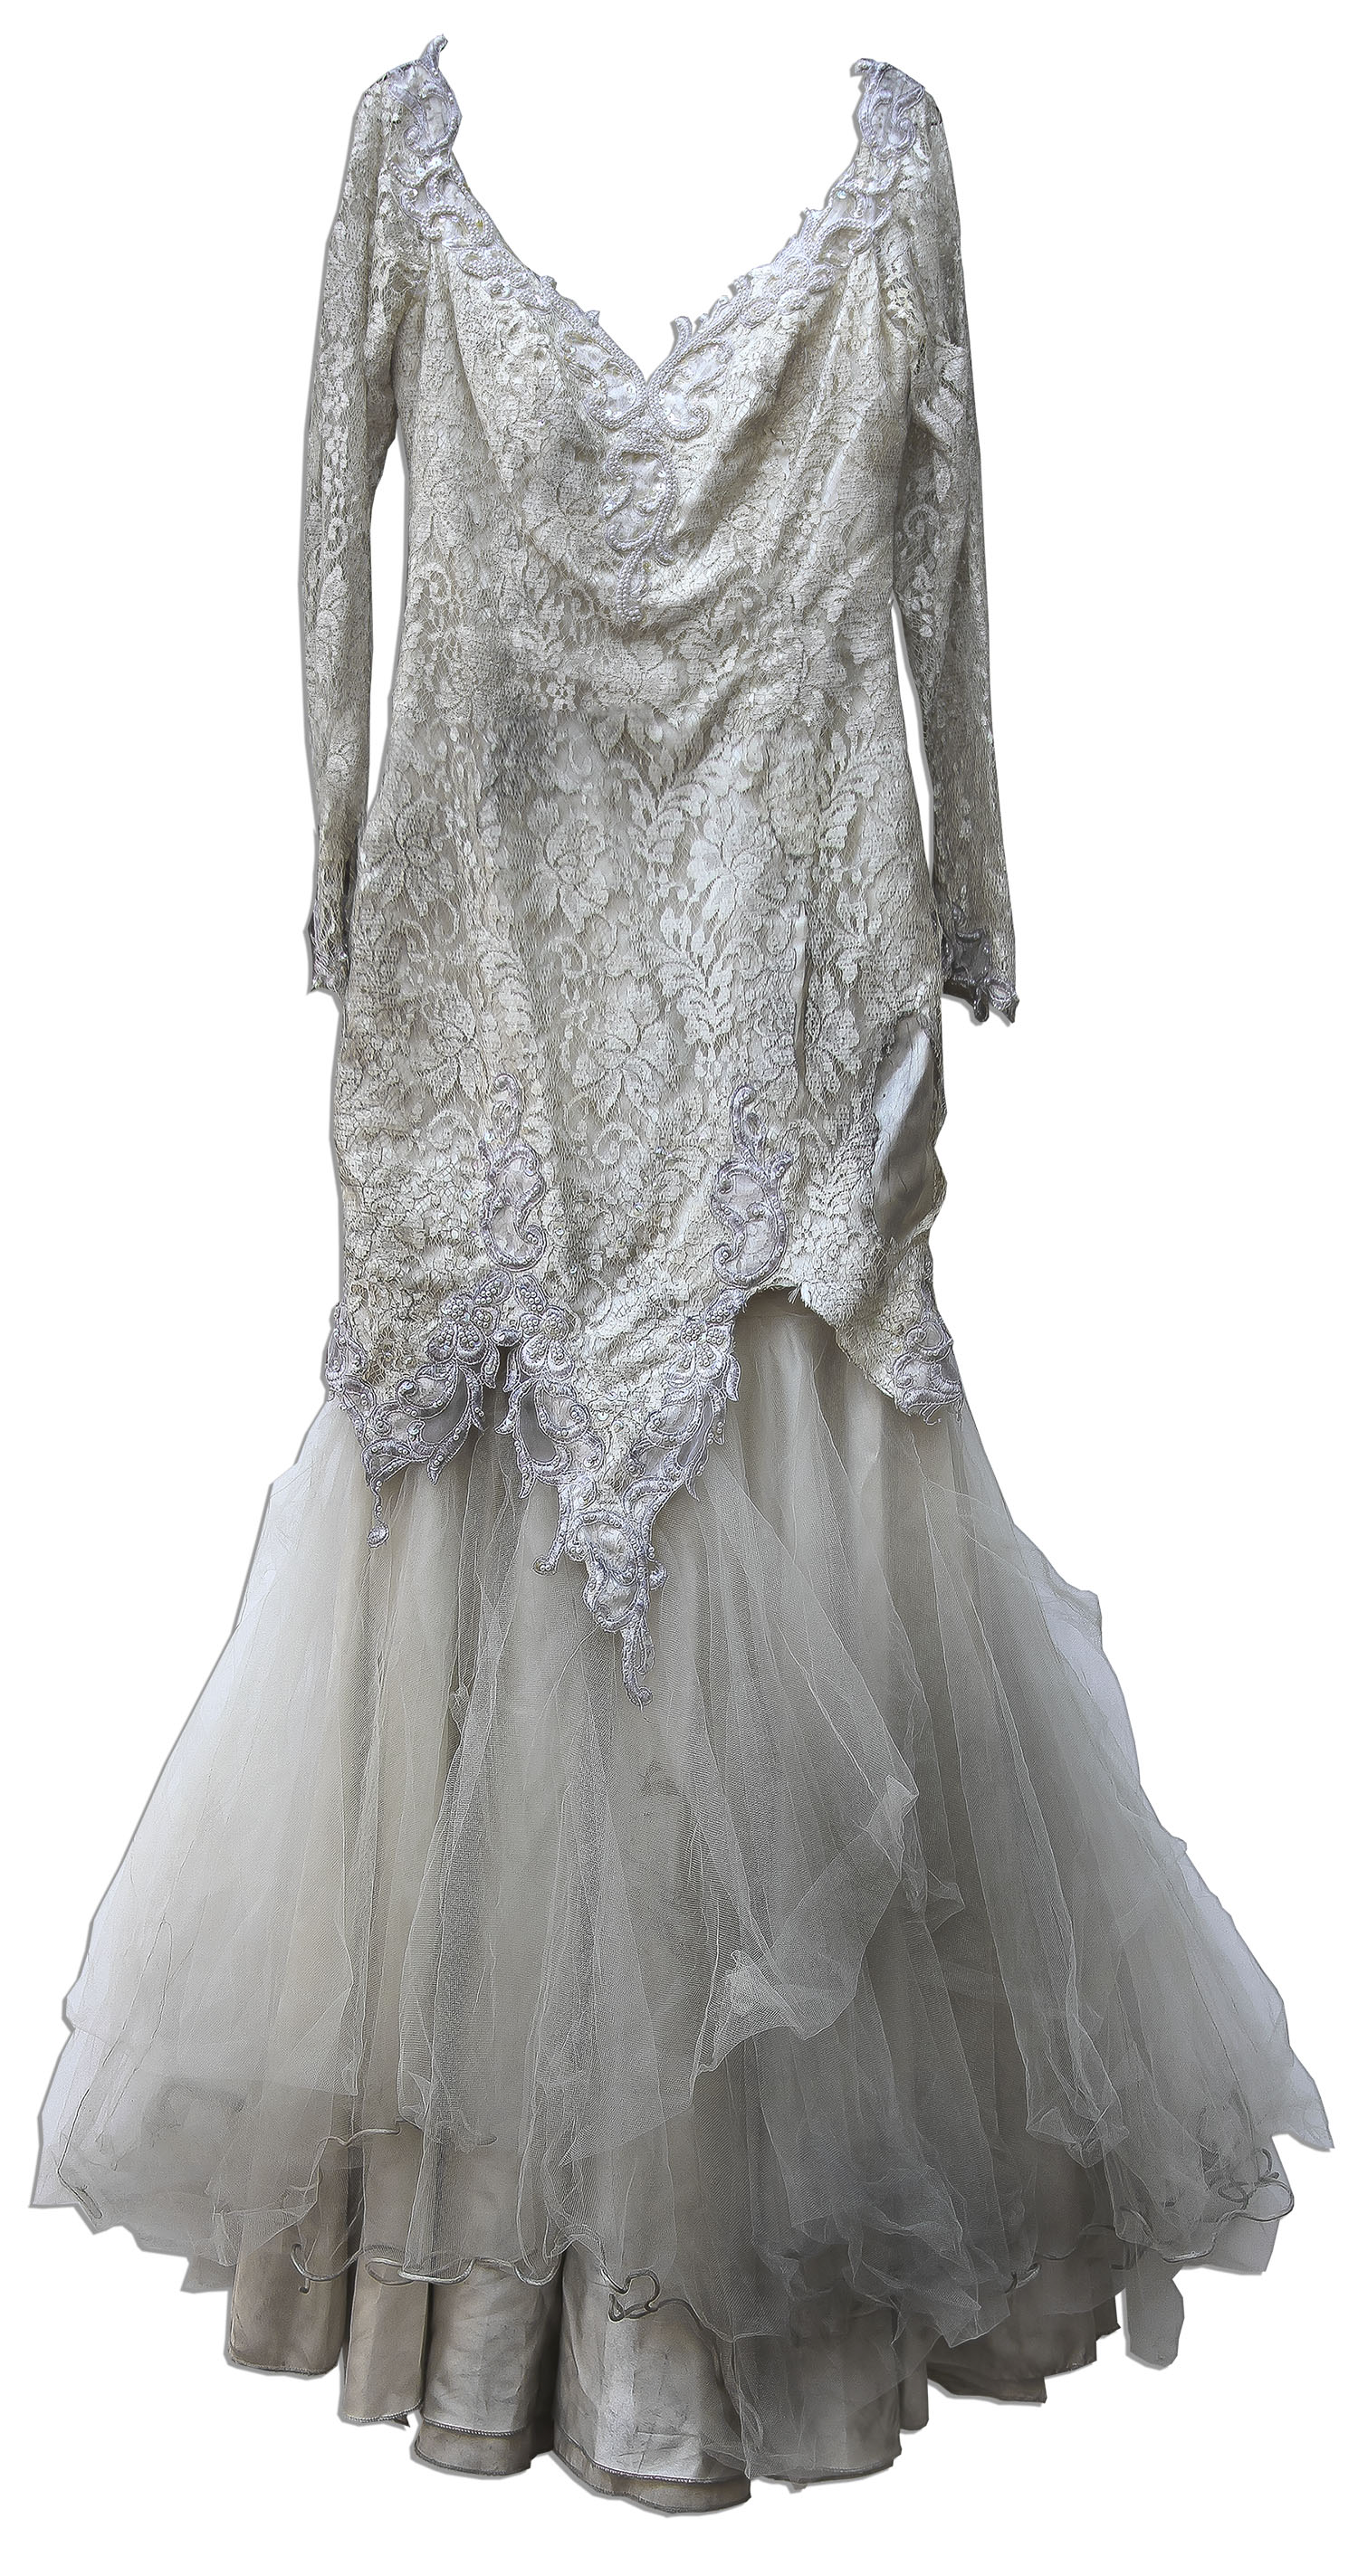 Lot Detail Cameron Diaz Wedding Dress From Feeling Minnesota